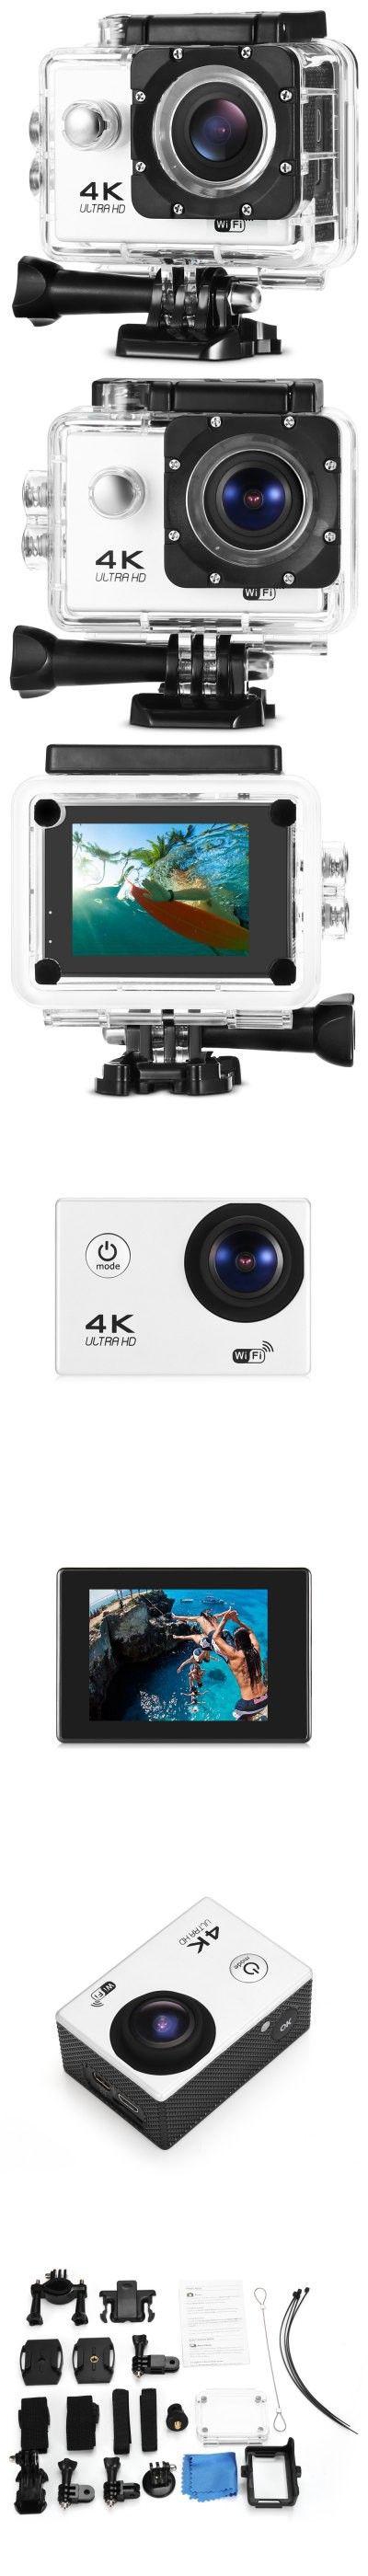 L2000 4K WiFi Action Sports Camera EU PLUG-$72.25